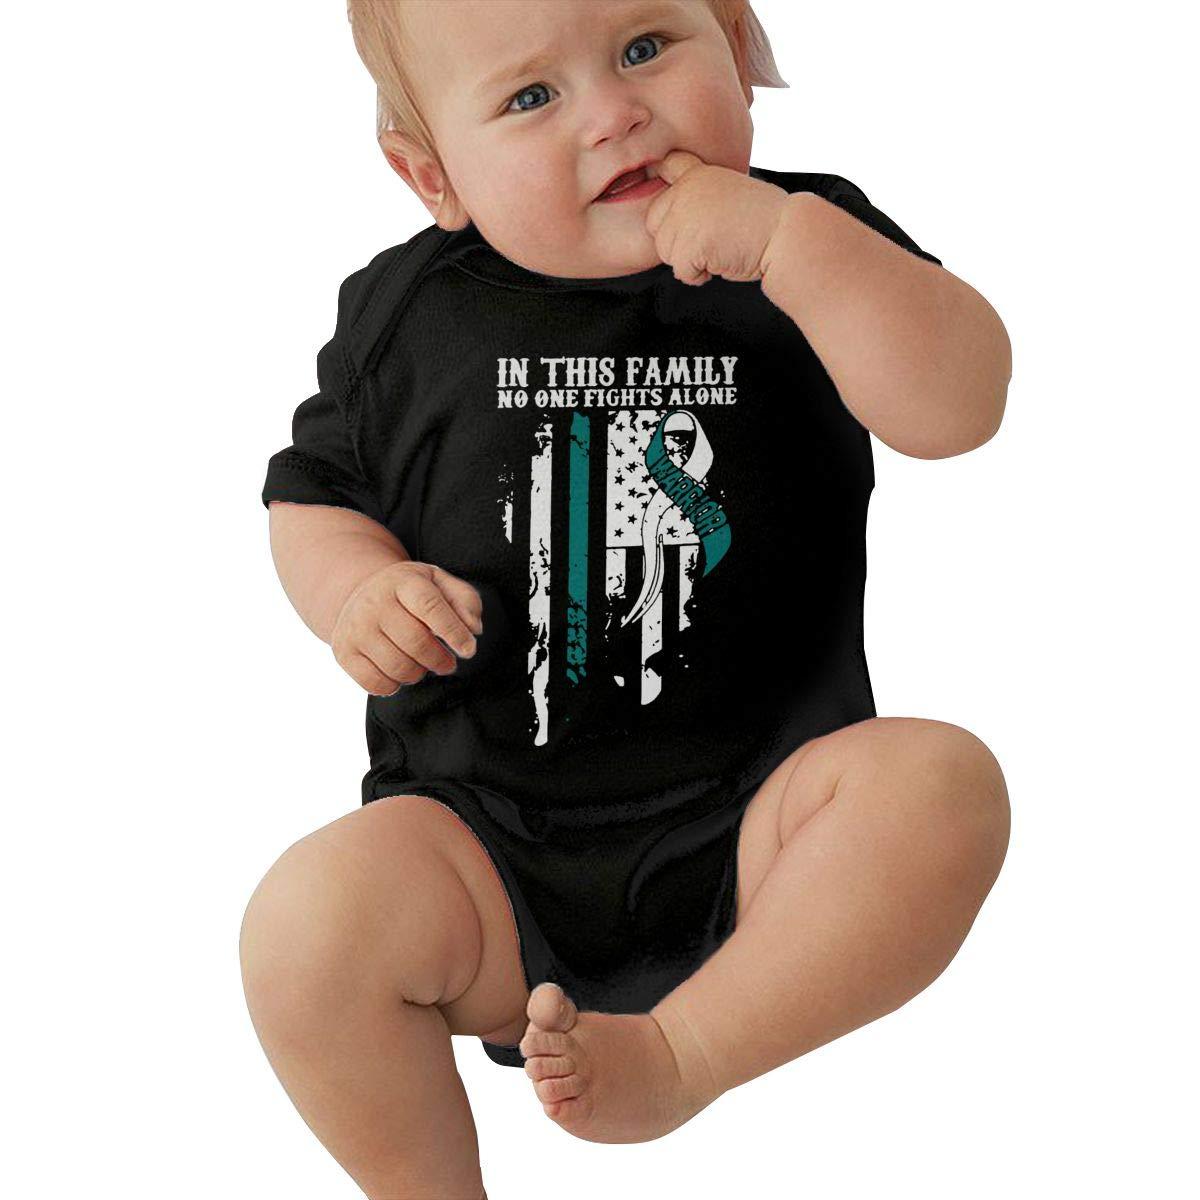 Cervical Cancer Awareness Kawaii Summer Infant Baby Girl Boys Short Sleeve Bodysuit Jumpsuit Outfits Shirt